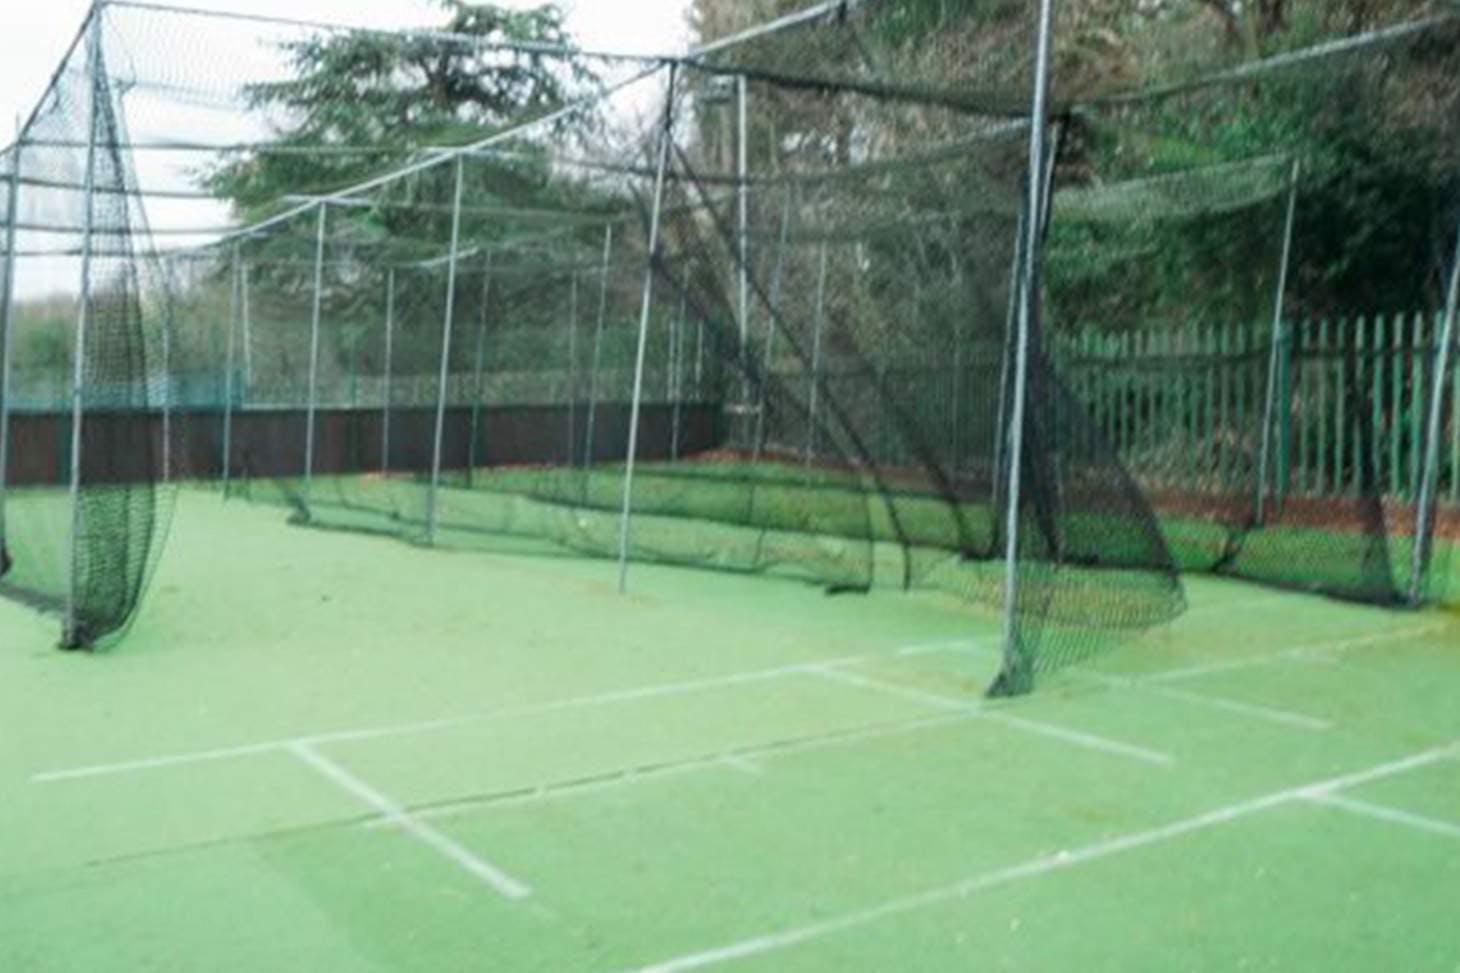 Chislehurst & Sidcup Grammar School Nets | Artificial cricket facilities